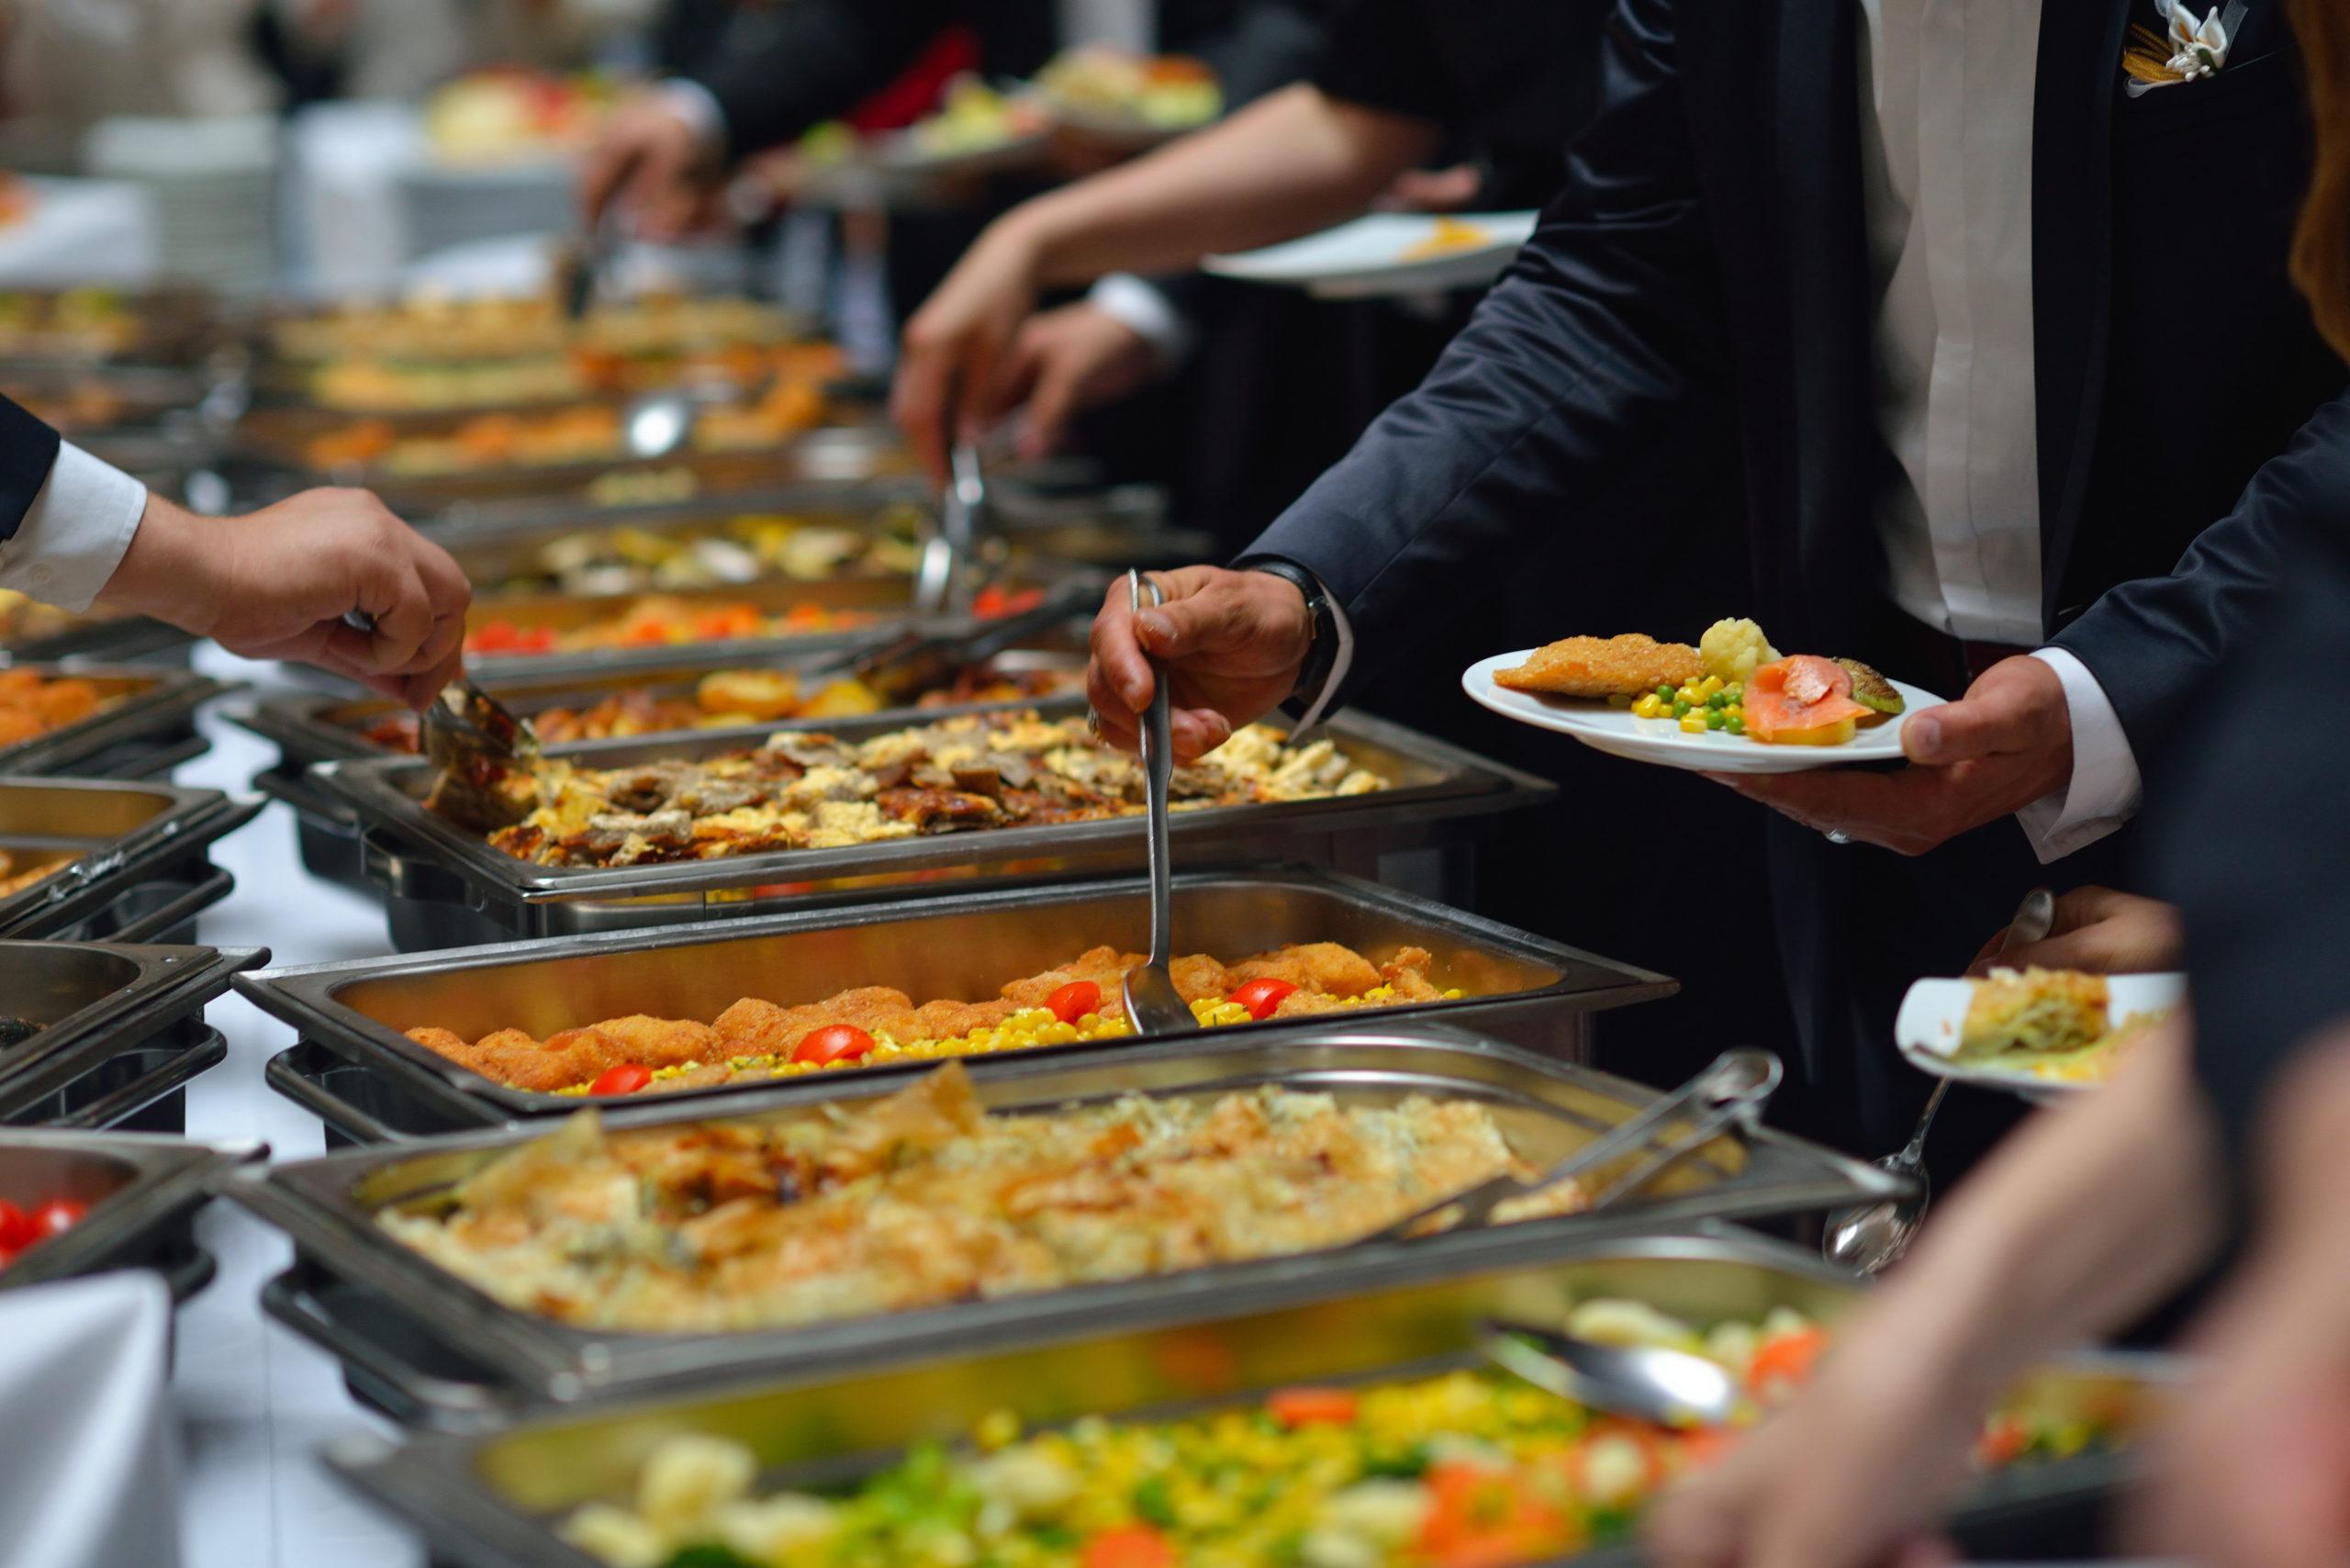 Partyverhuur in Flevoland nodig?   JB's Party & Catering